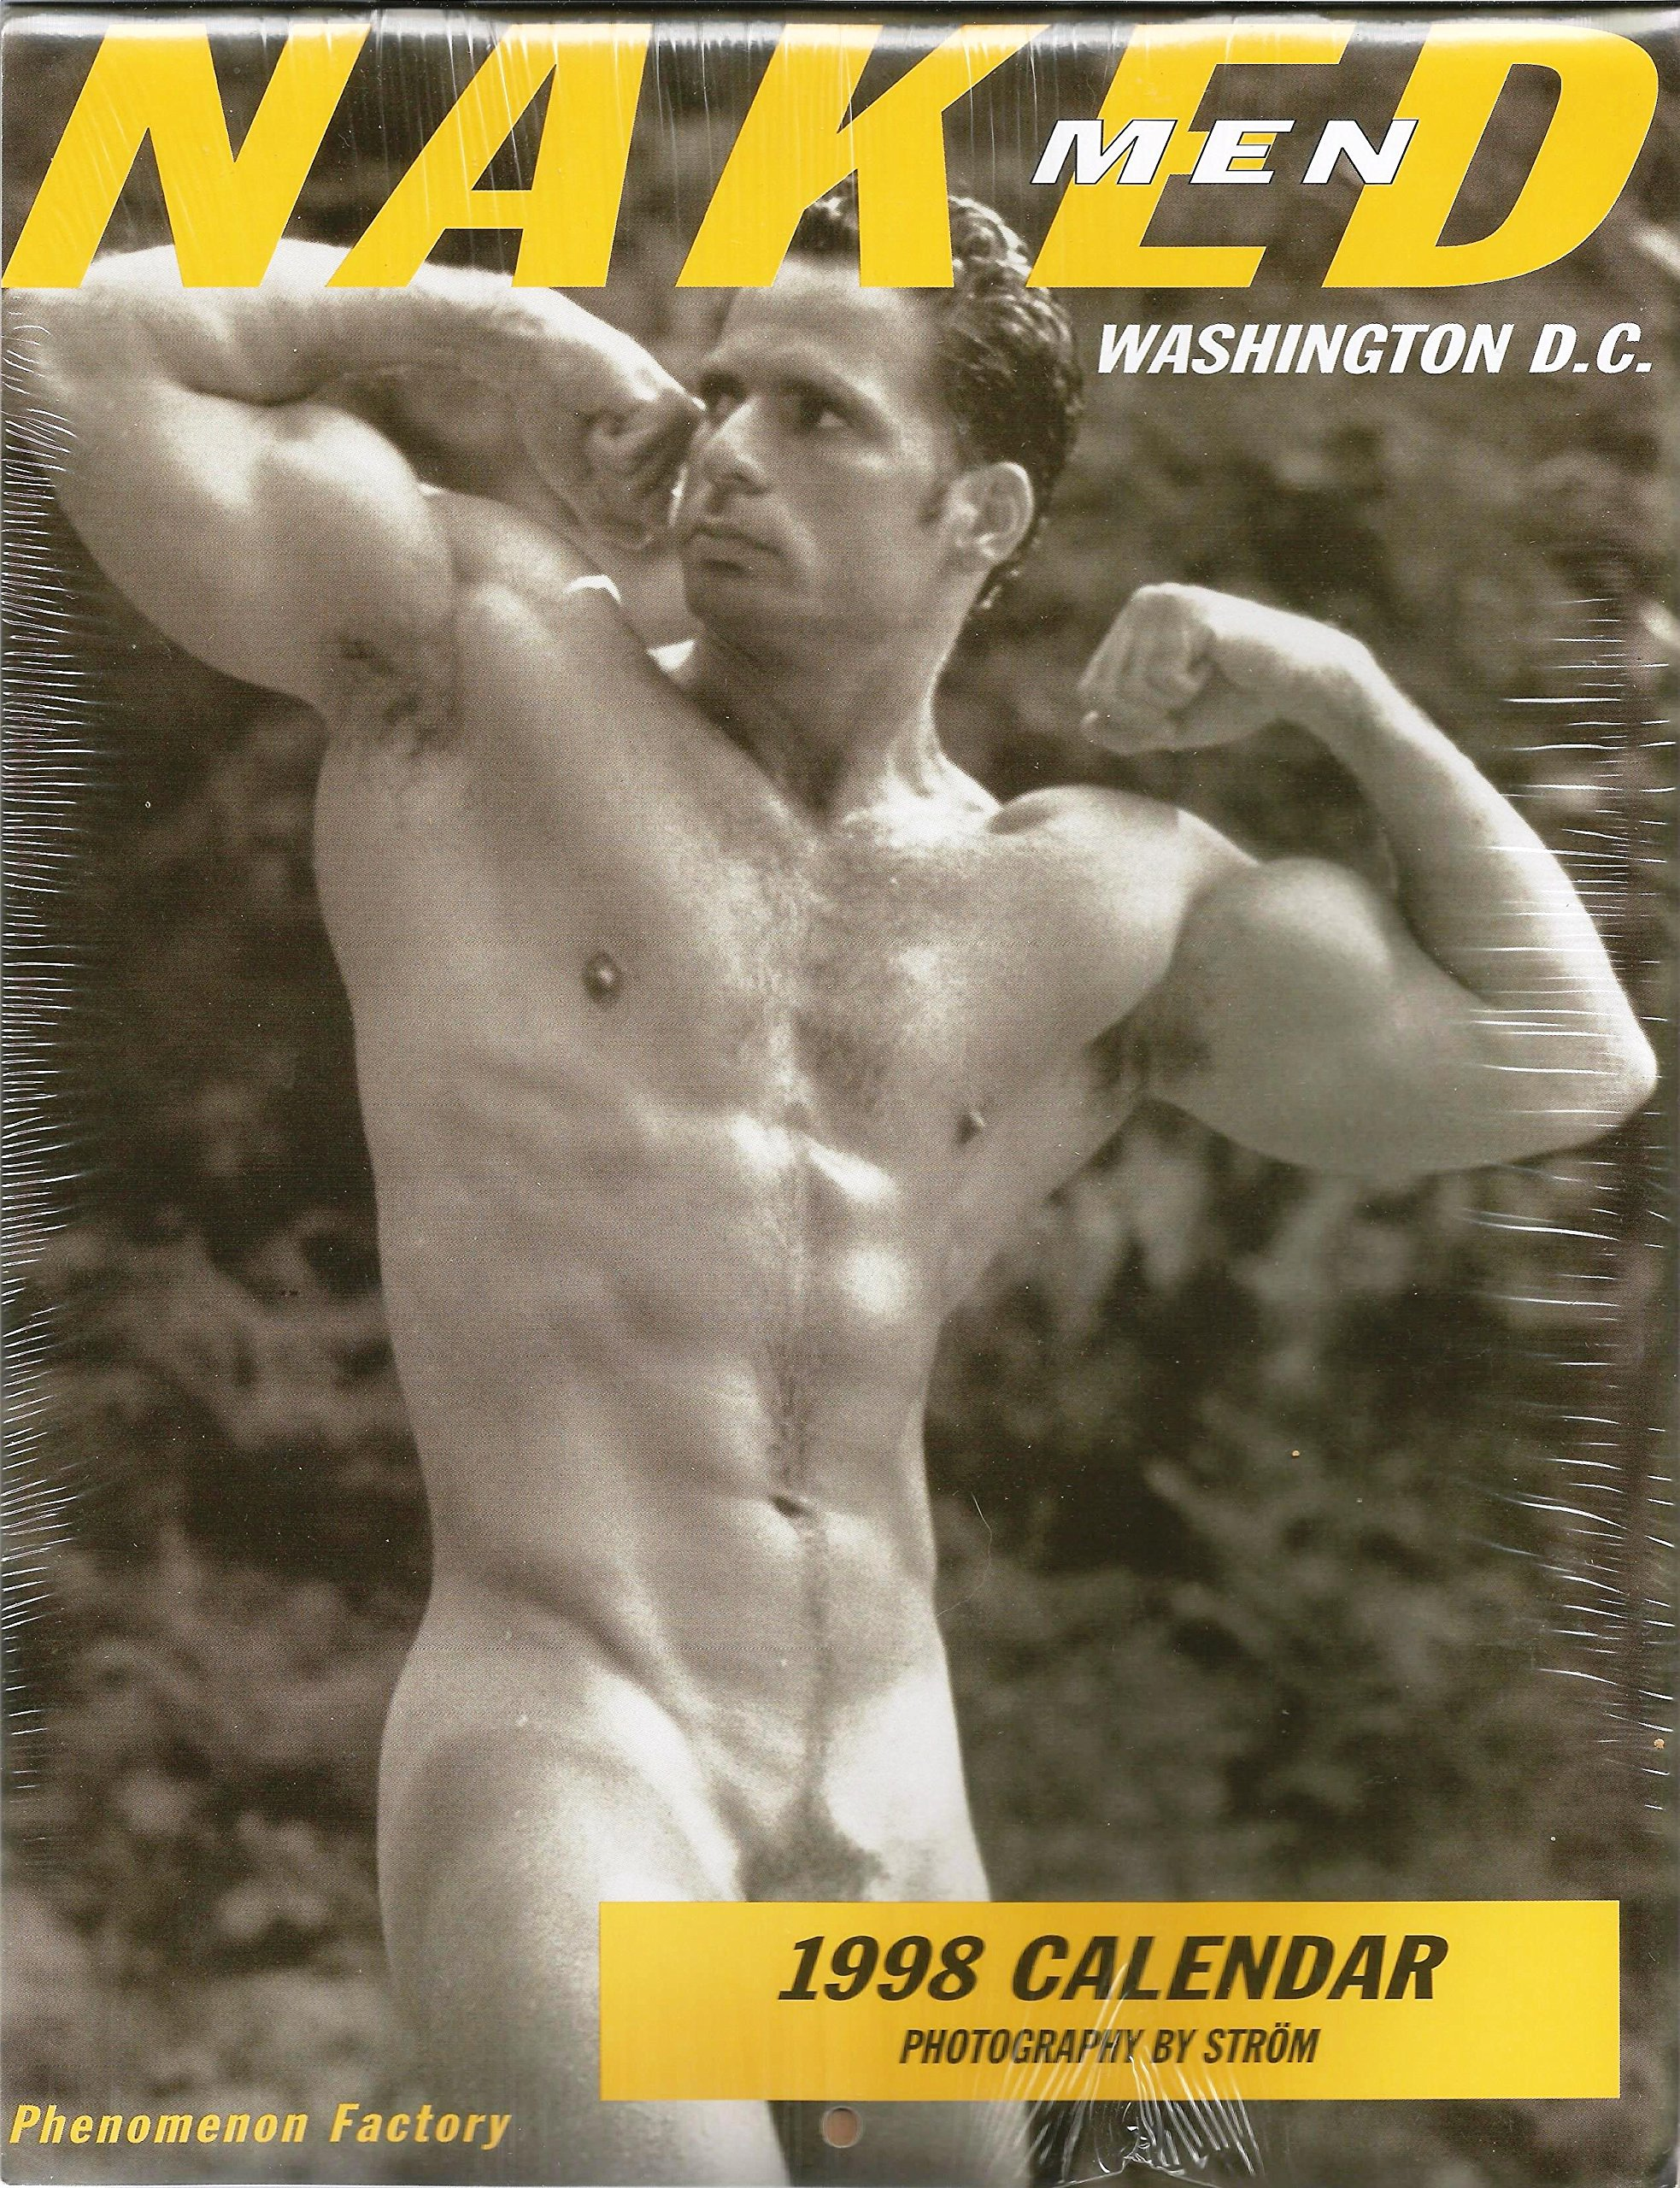 Word Nude male model washington dc